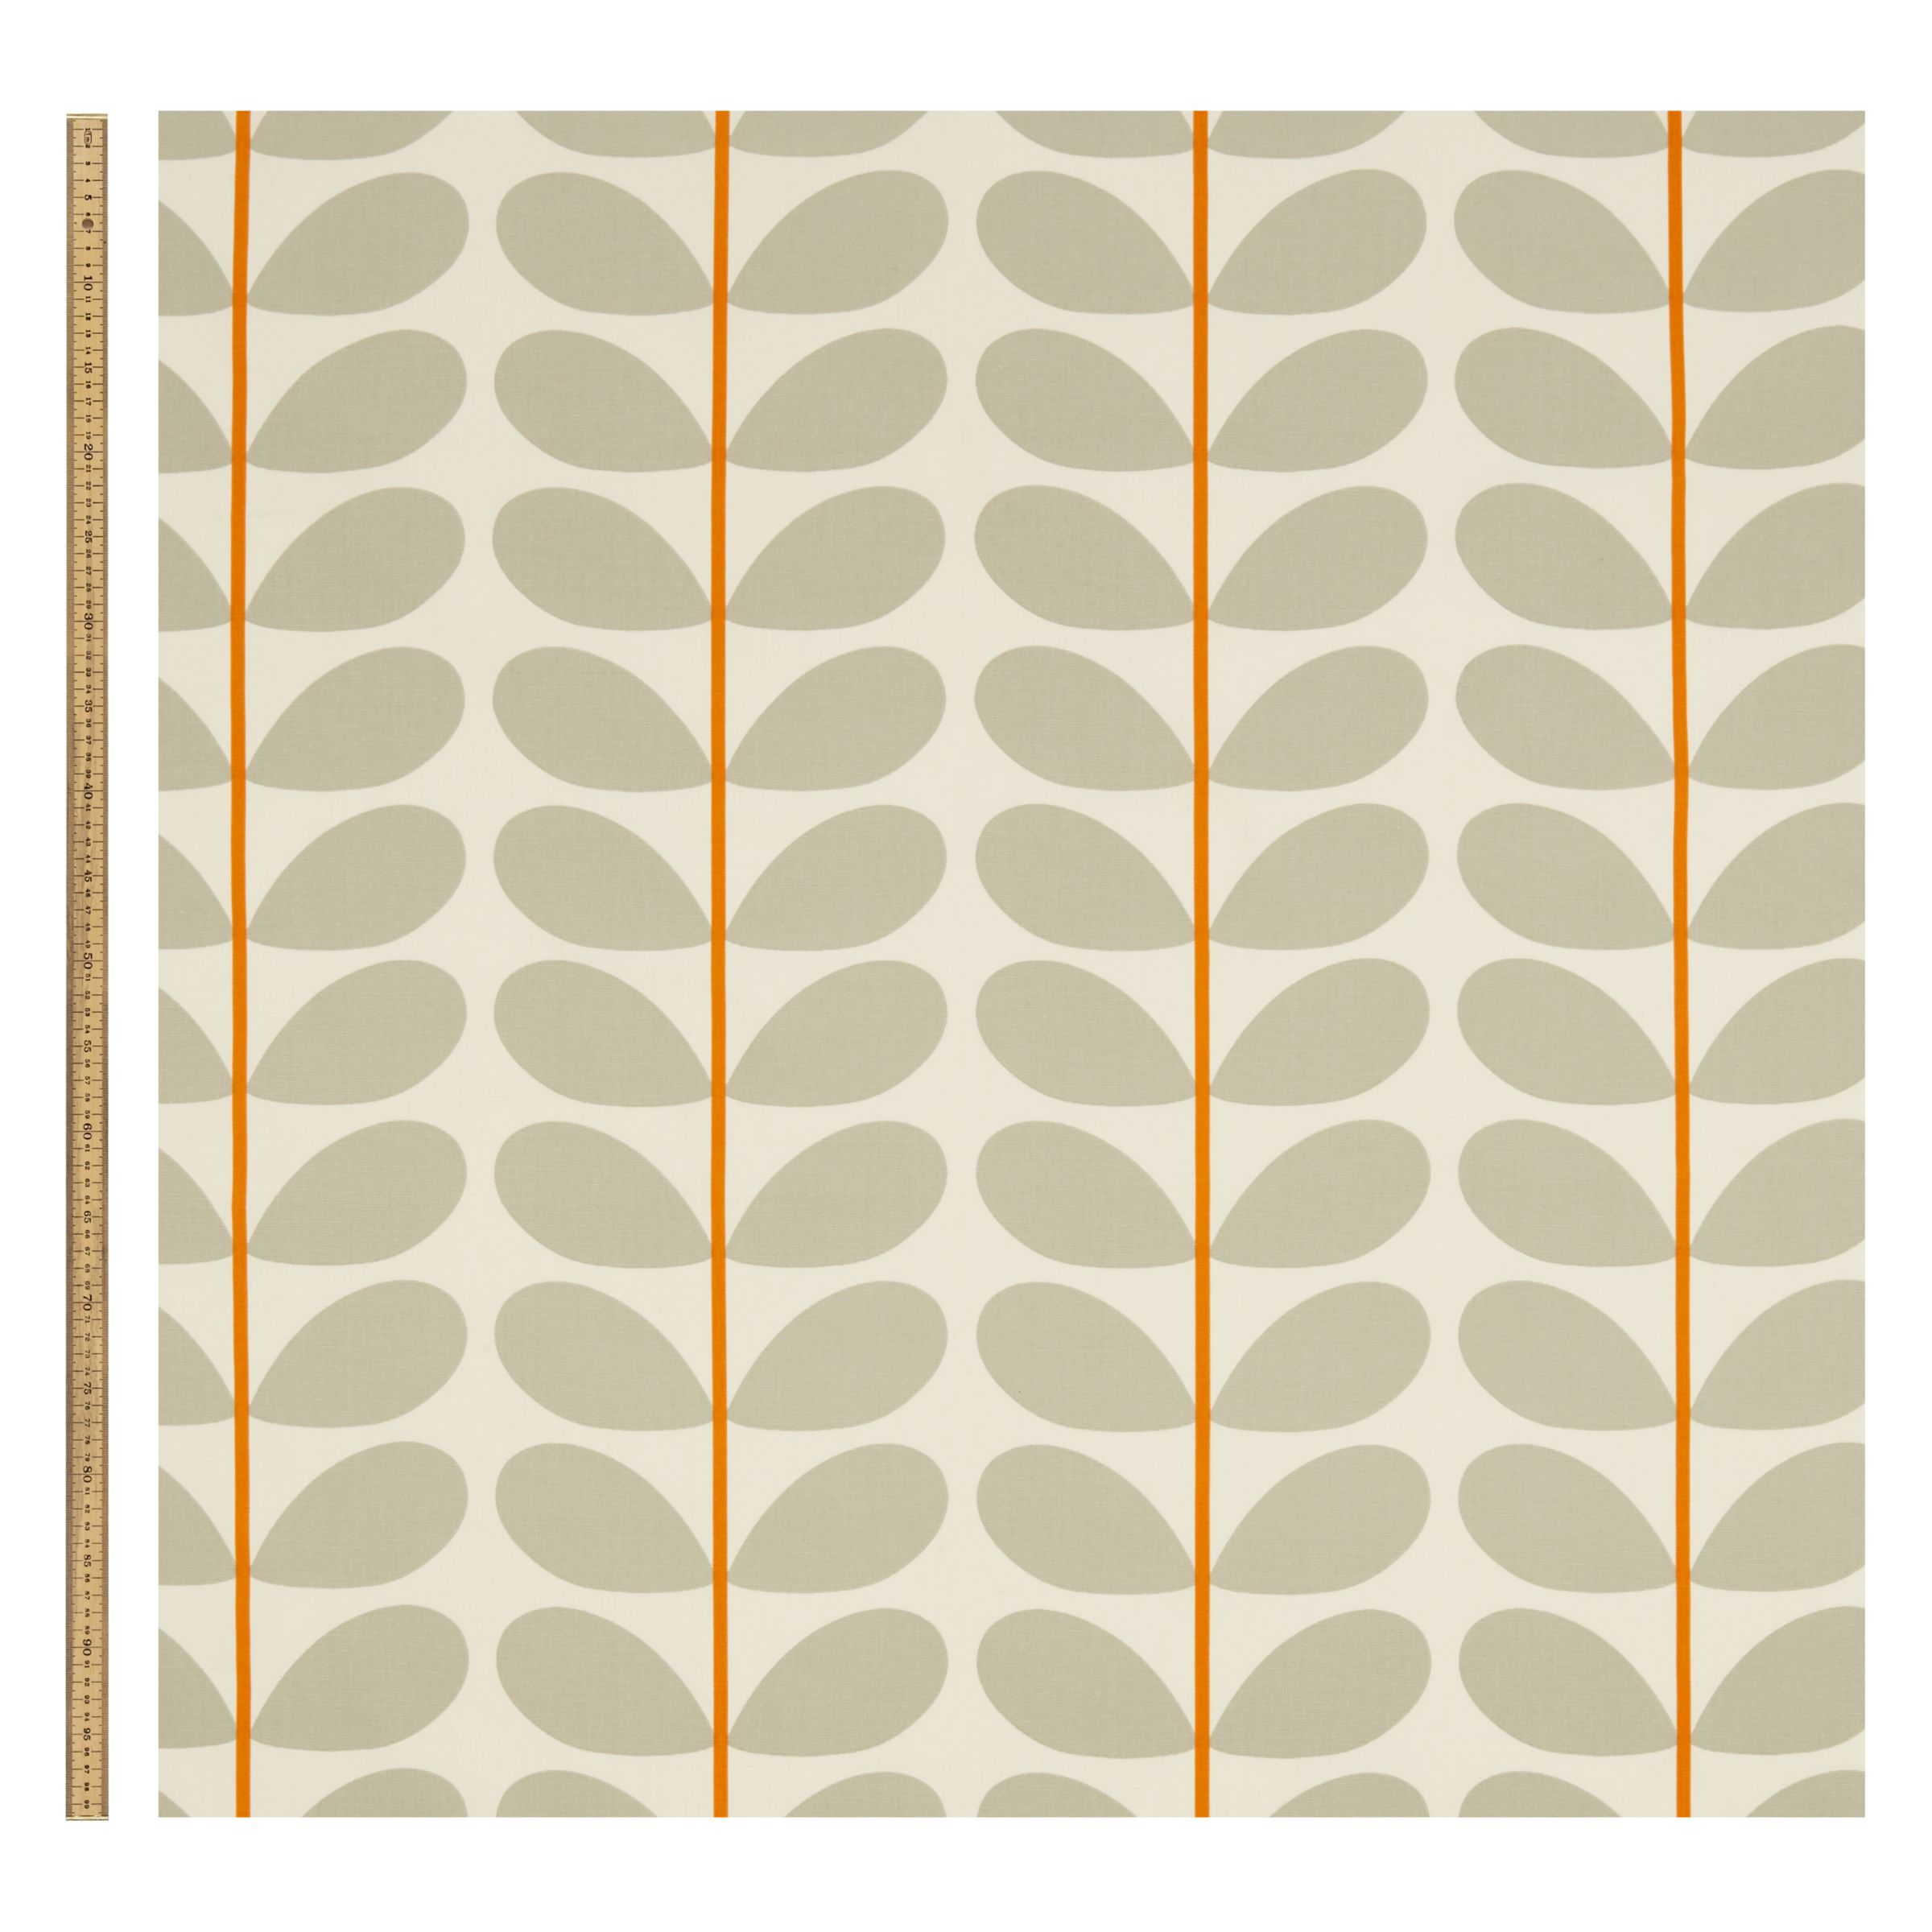 Dryer Belt Diagram 8 10 From 57 Votes Dryer Belt Diagram 4 10 From 63